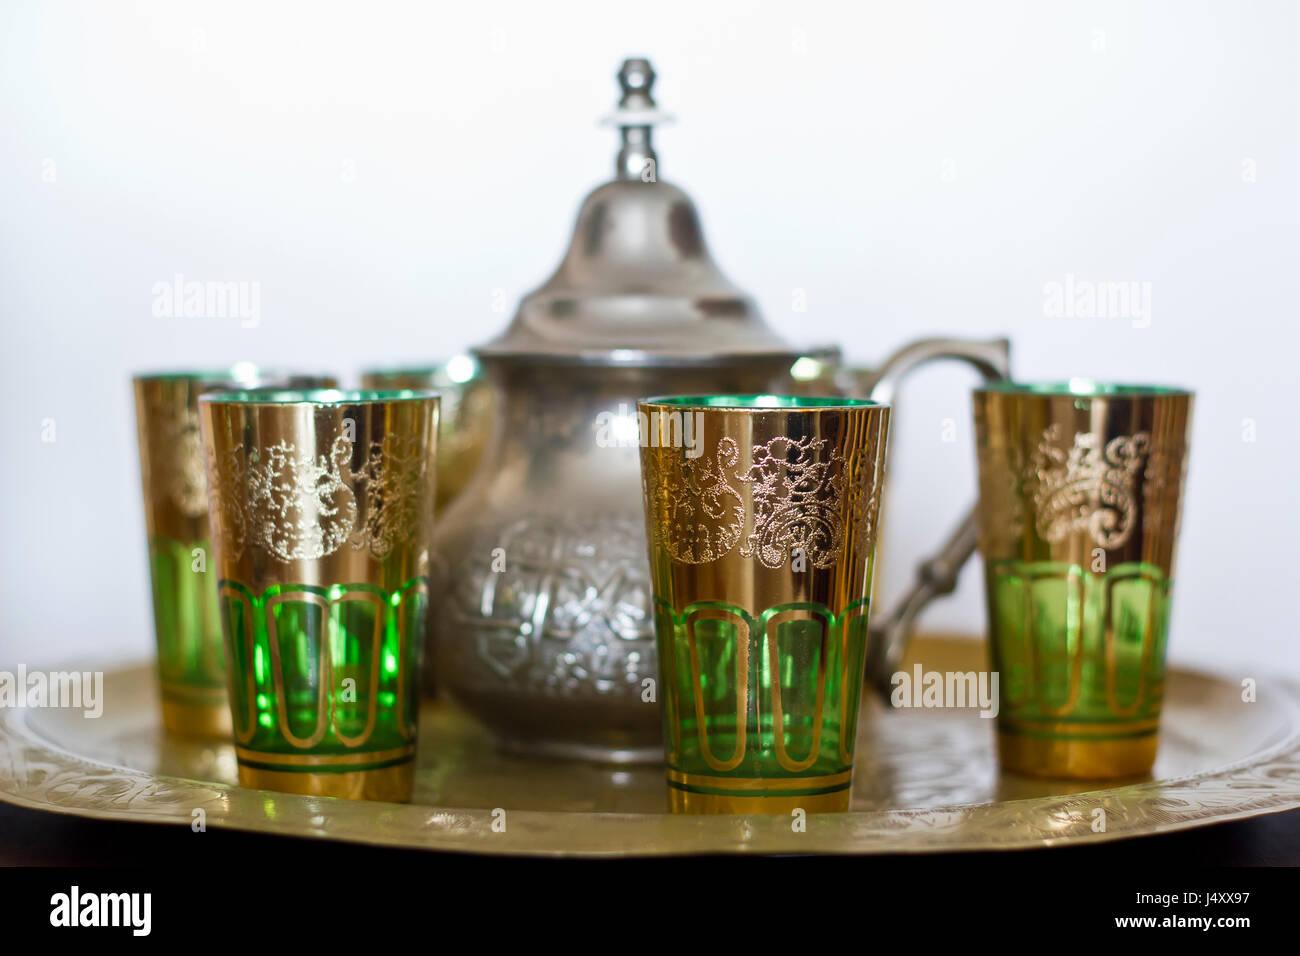 Morrocco traditional tea service - Stock Image